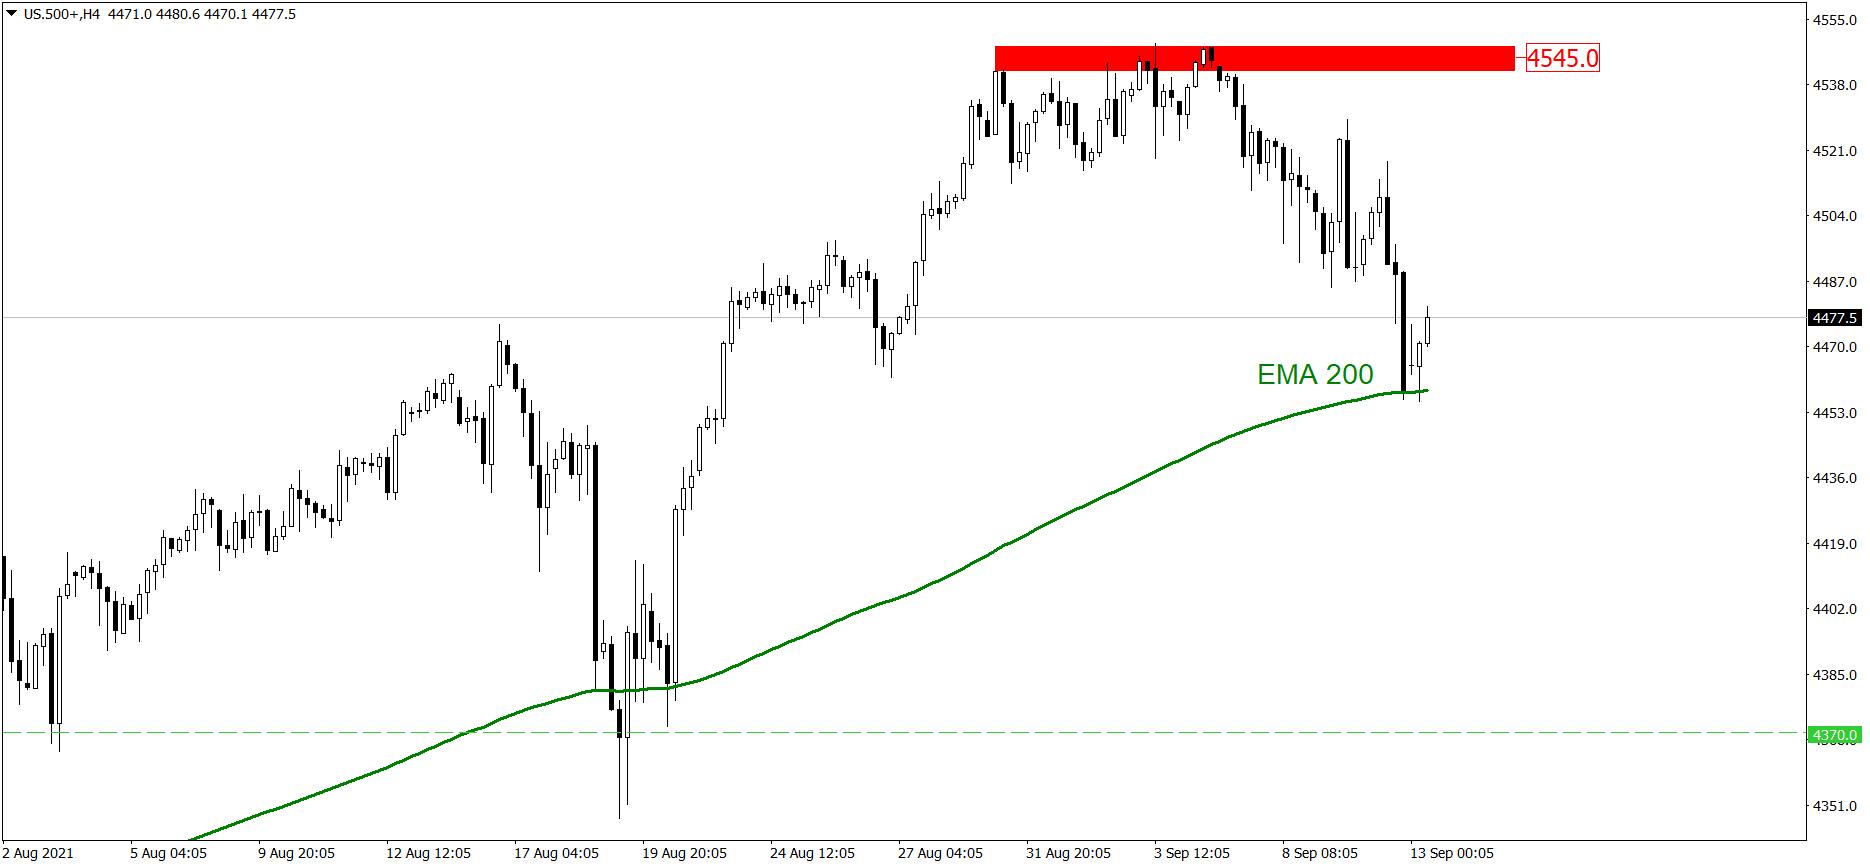 Analiza indeksu S&P 500